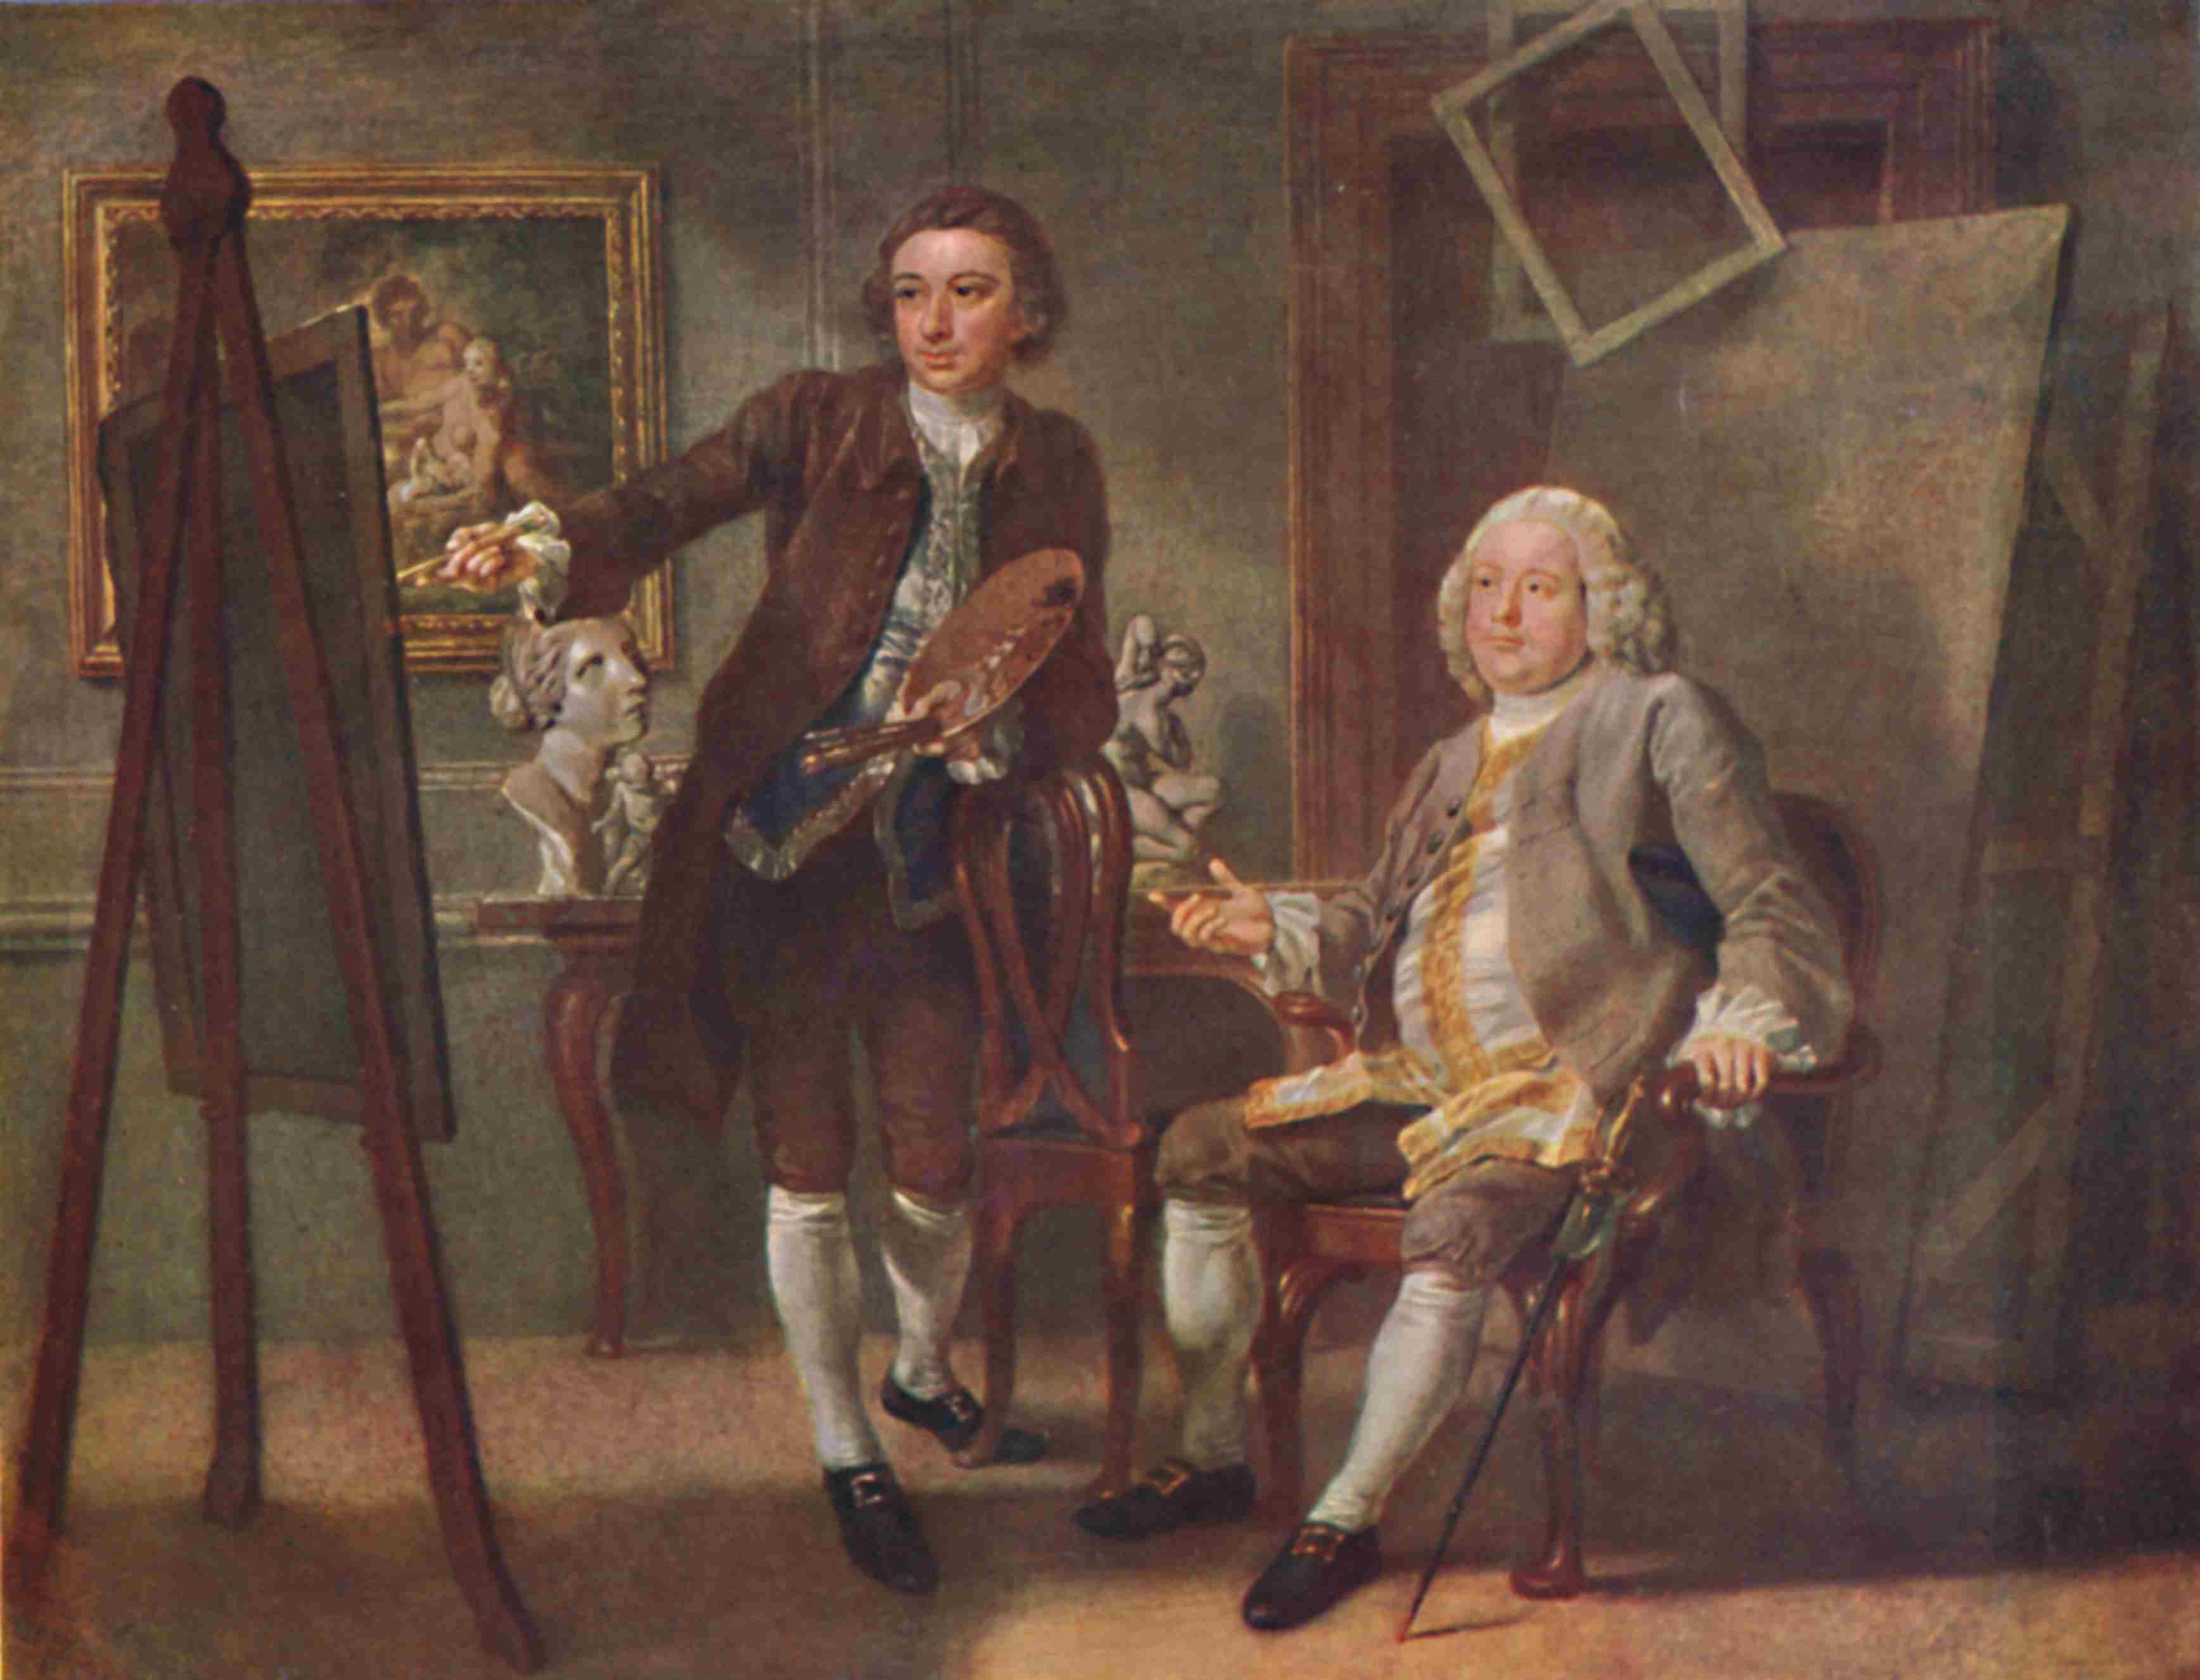 Robert Walpole First Earl Of Orford Kg In The Studio Of Francis Hayman Ra Circa 1748-1750